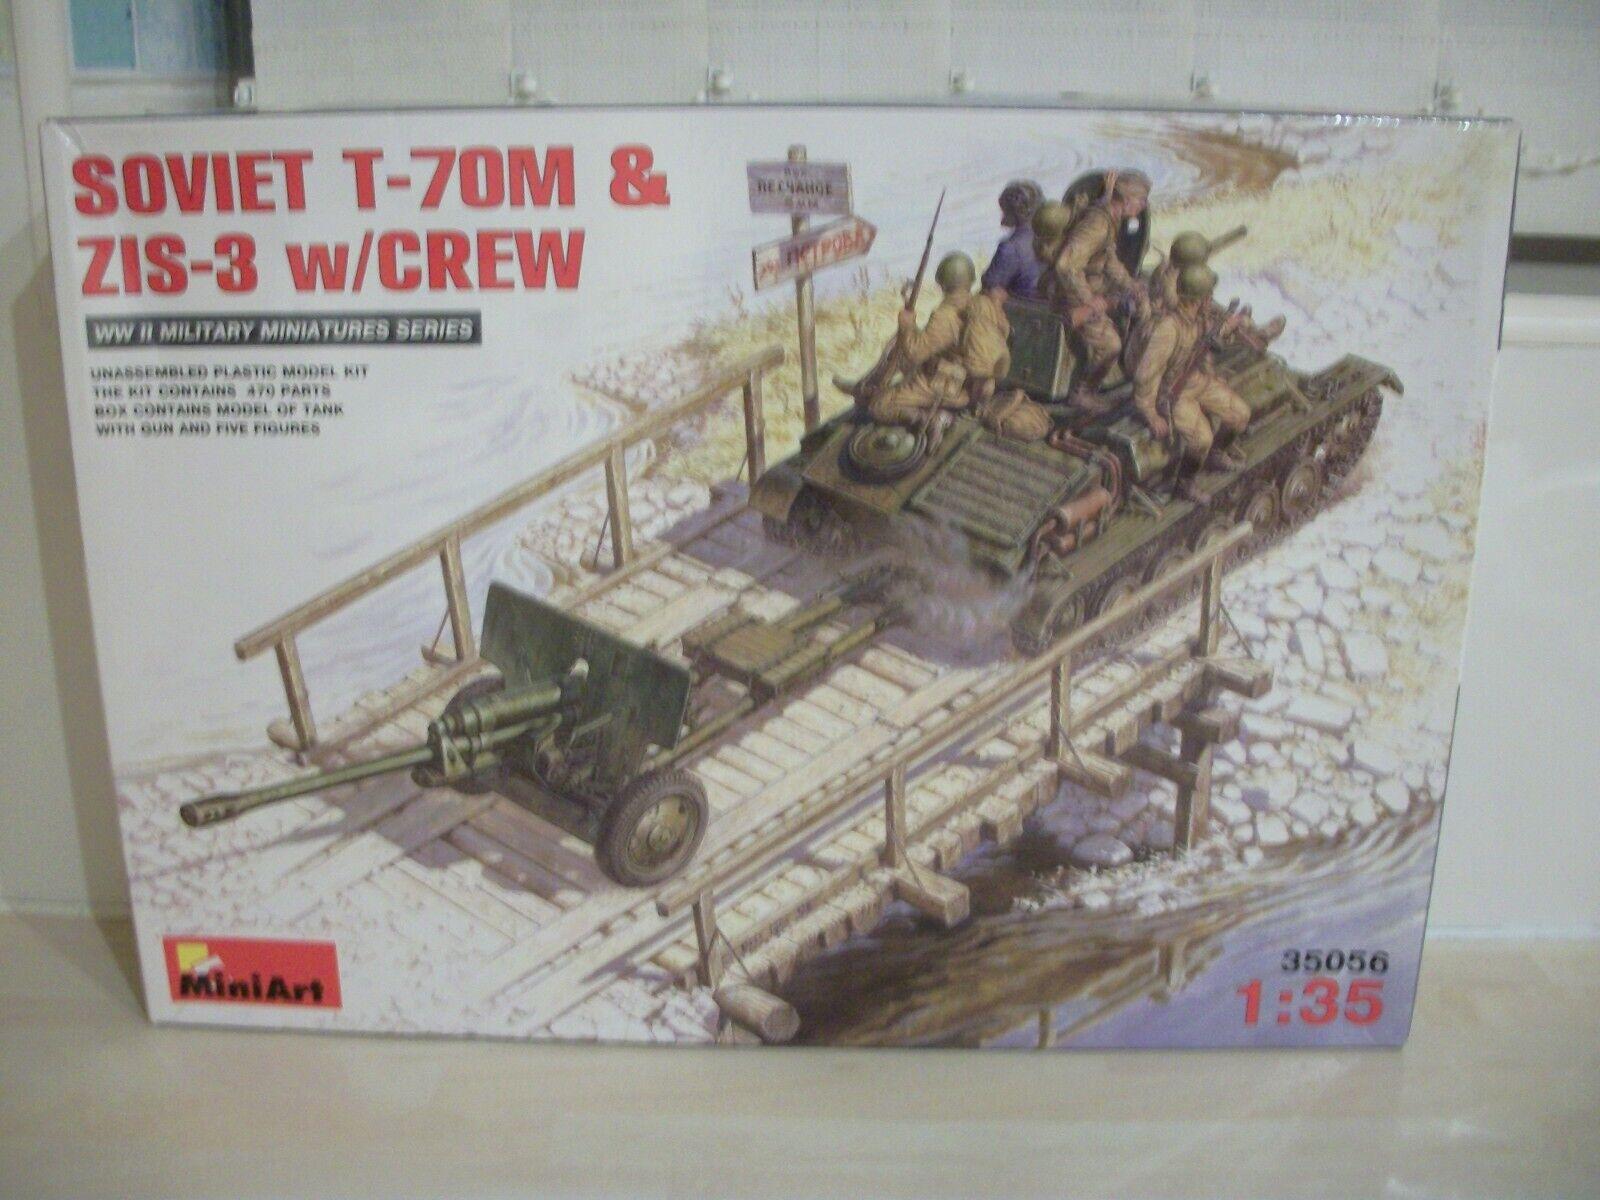 MiniArt 35056 1 35 Scale Soviet T-70M & ZIS-3 with Crew Model Kit